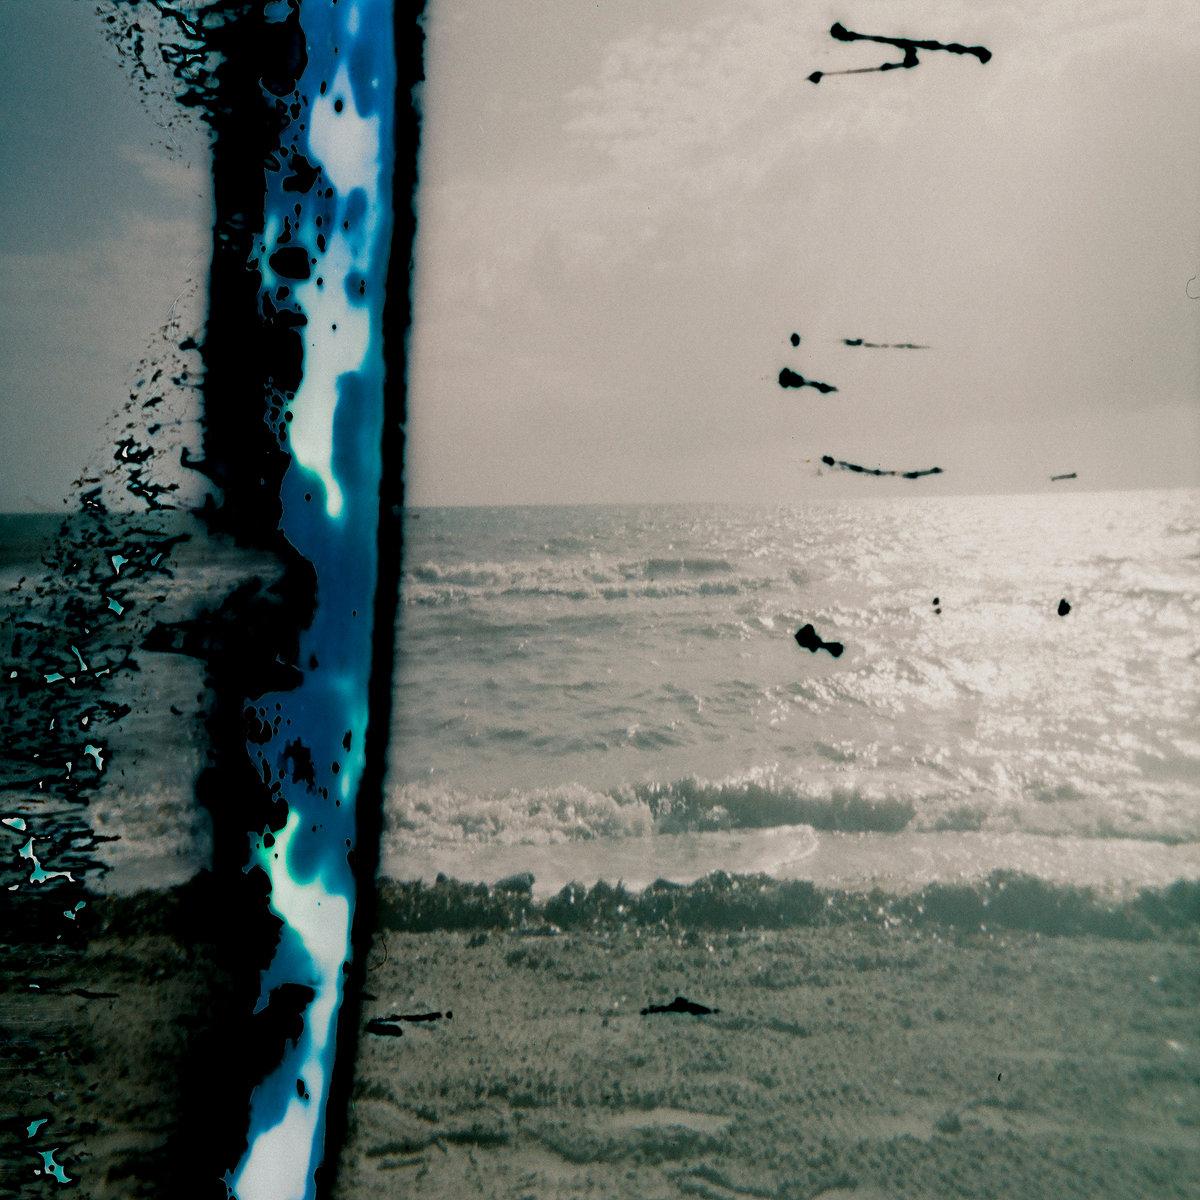 JM_High Tide Falling